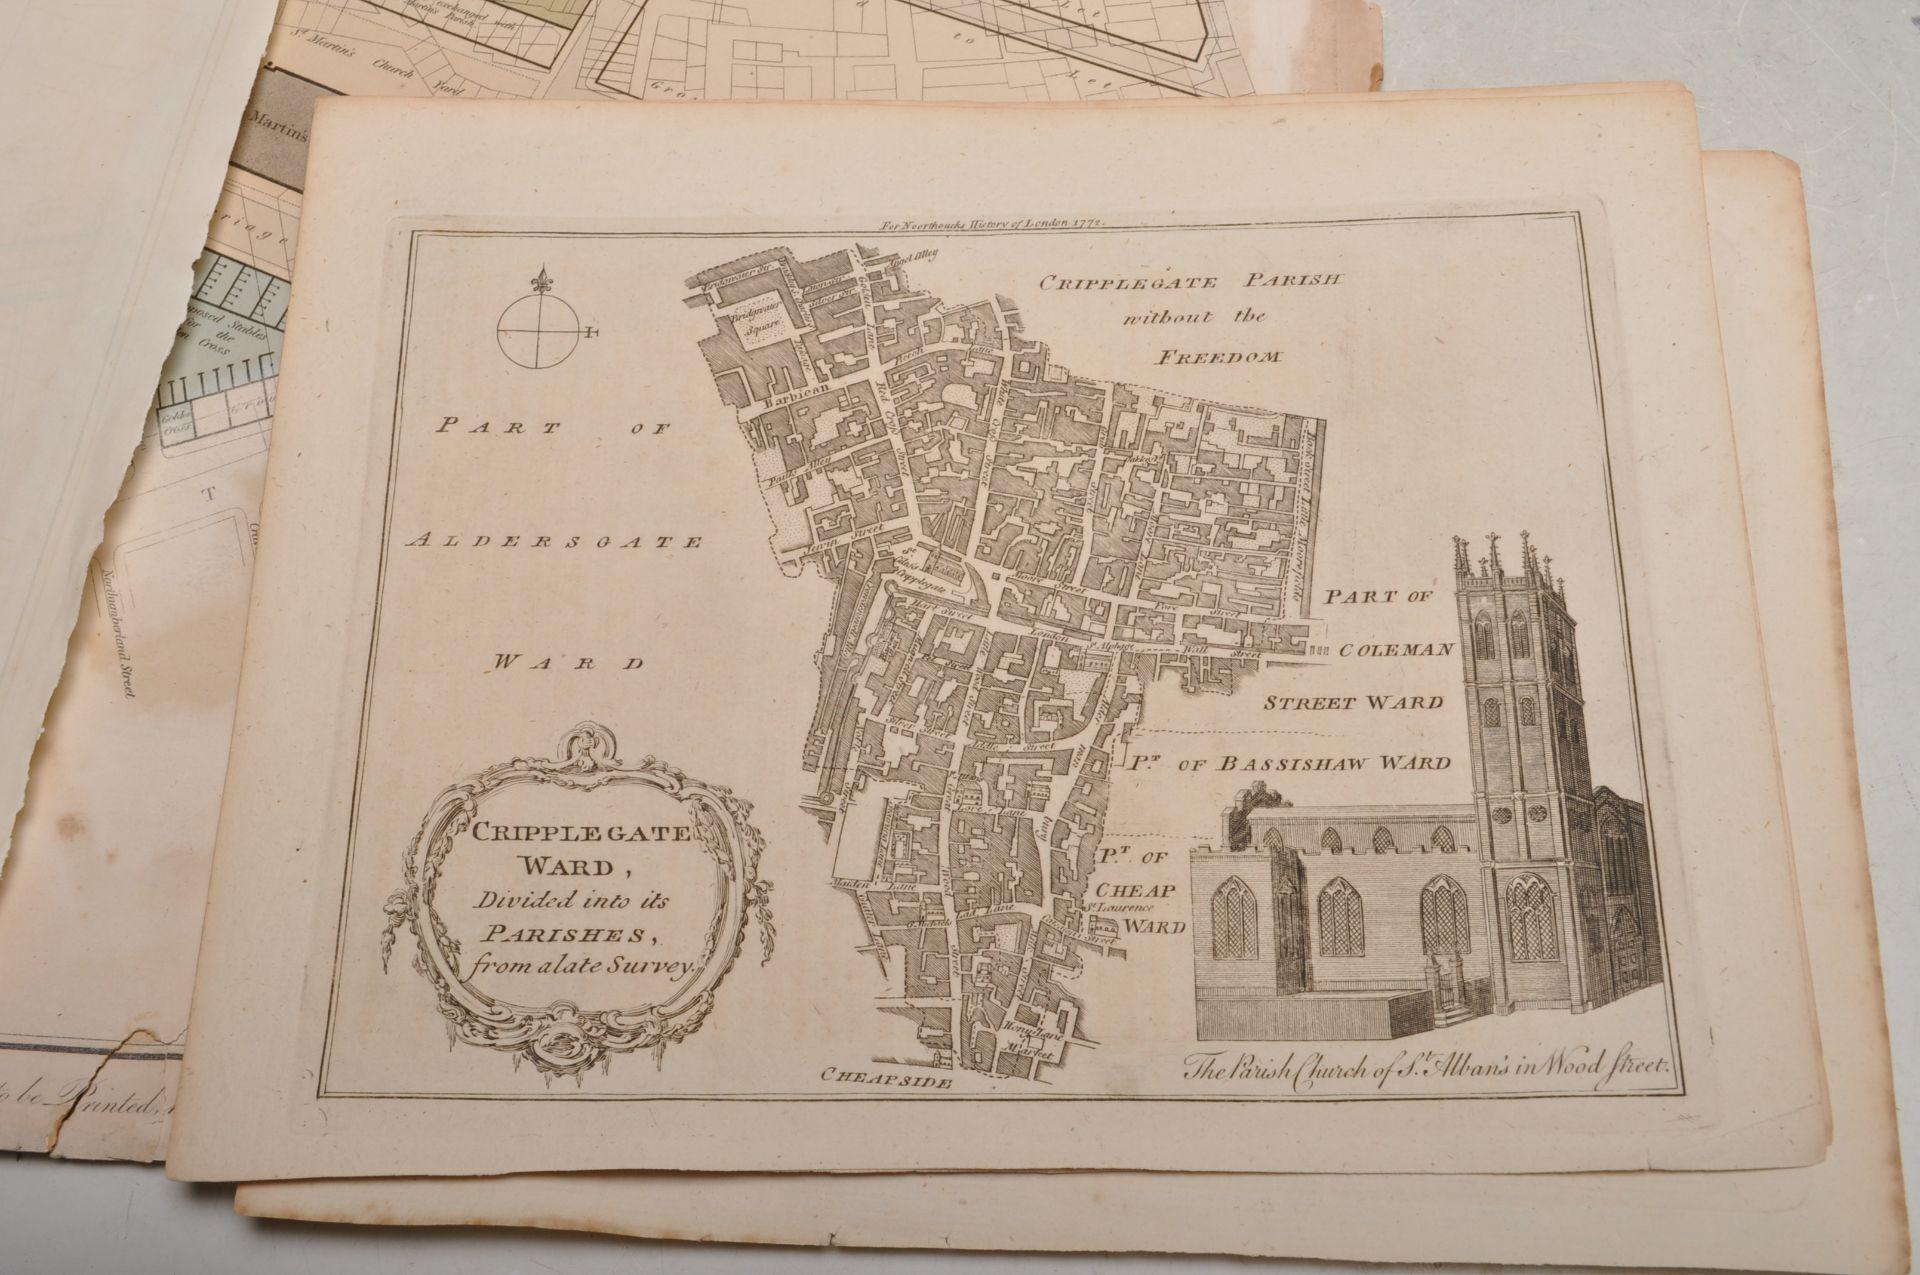 COLLECTION OF ANTIQUE LONDON RELATED MAPS & PLANS - Bild 7 aus 10